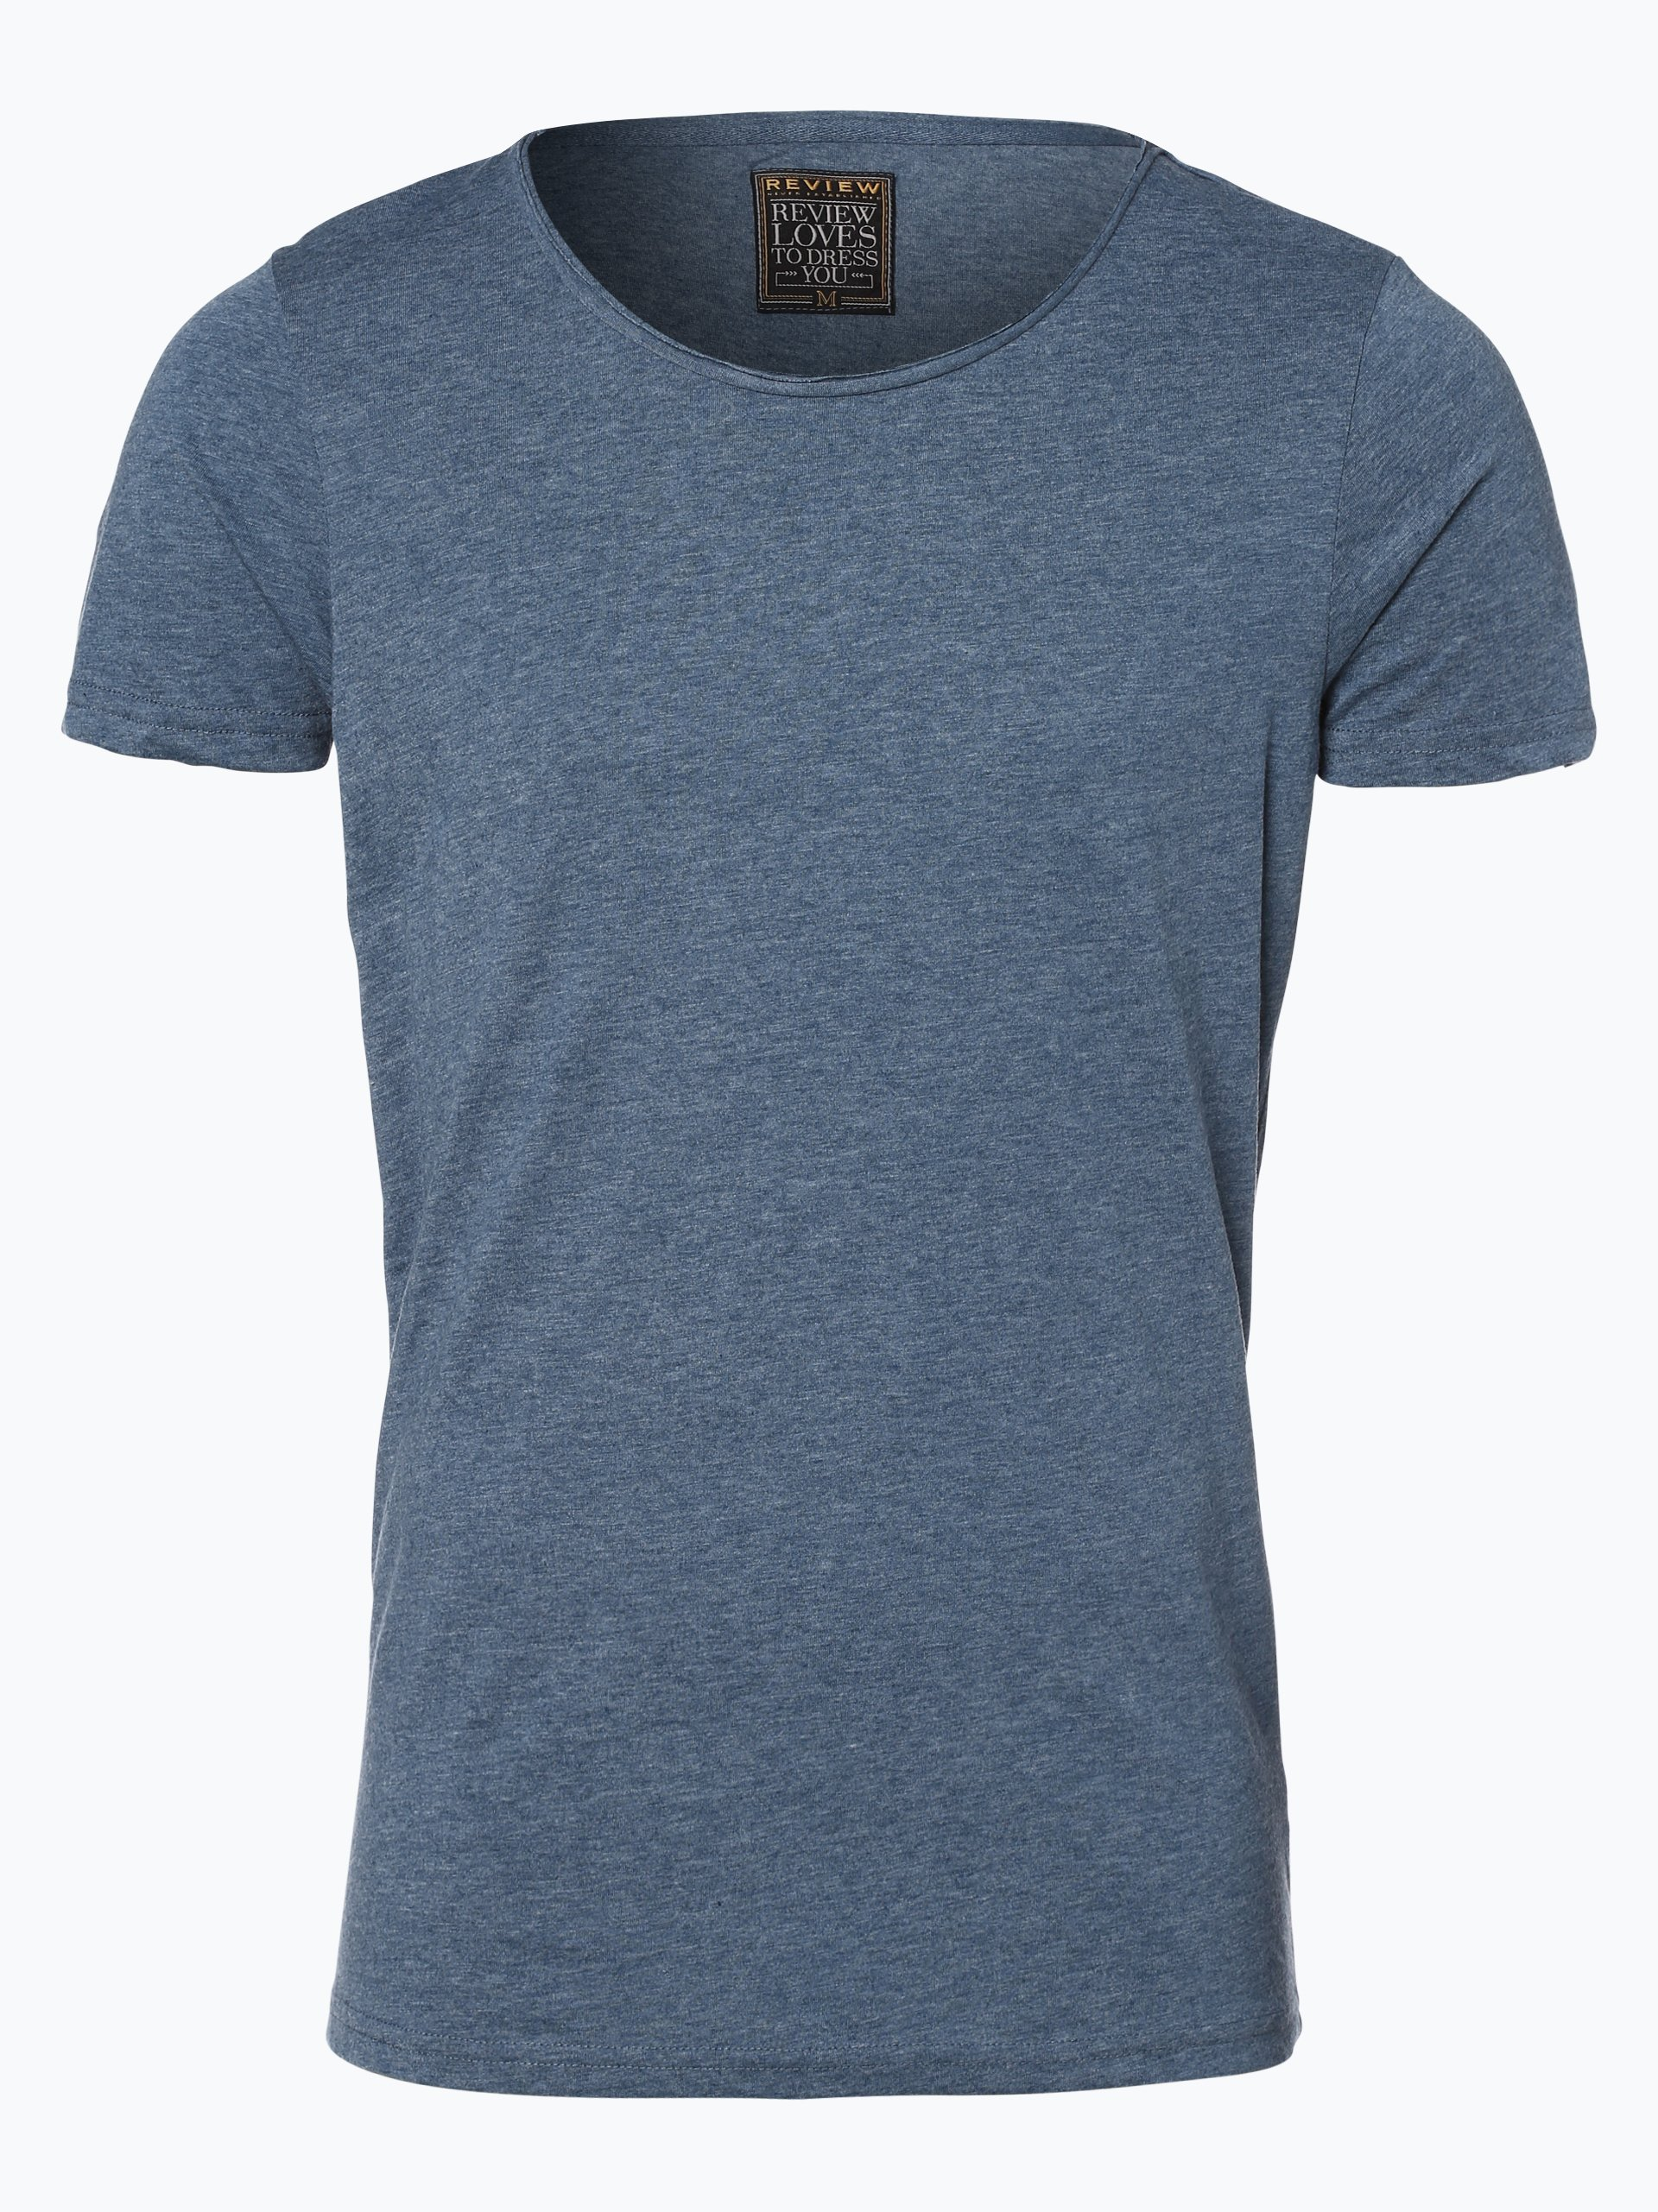 review herren t shirt denim uni online kaufen vangraaf com. Black Bedroom Furniture Sets. Home Design Ideas